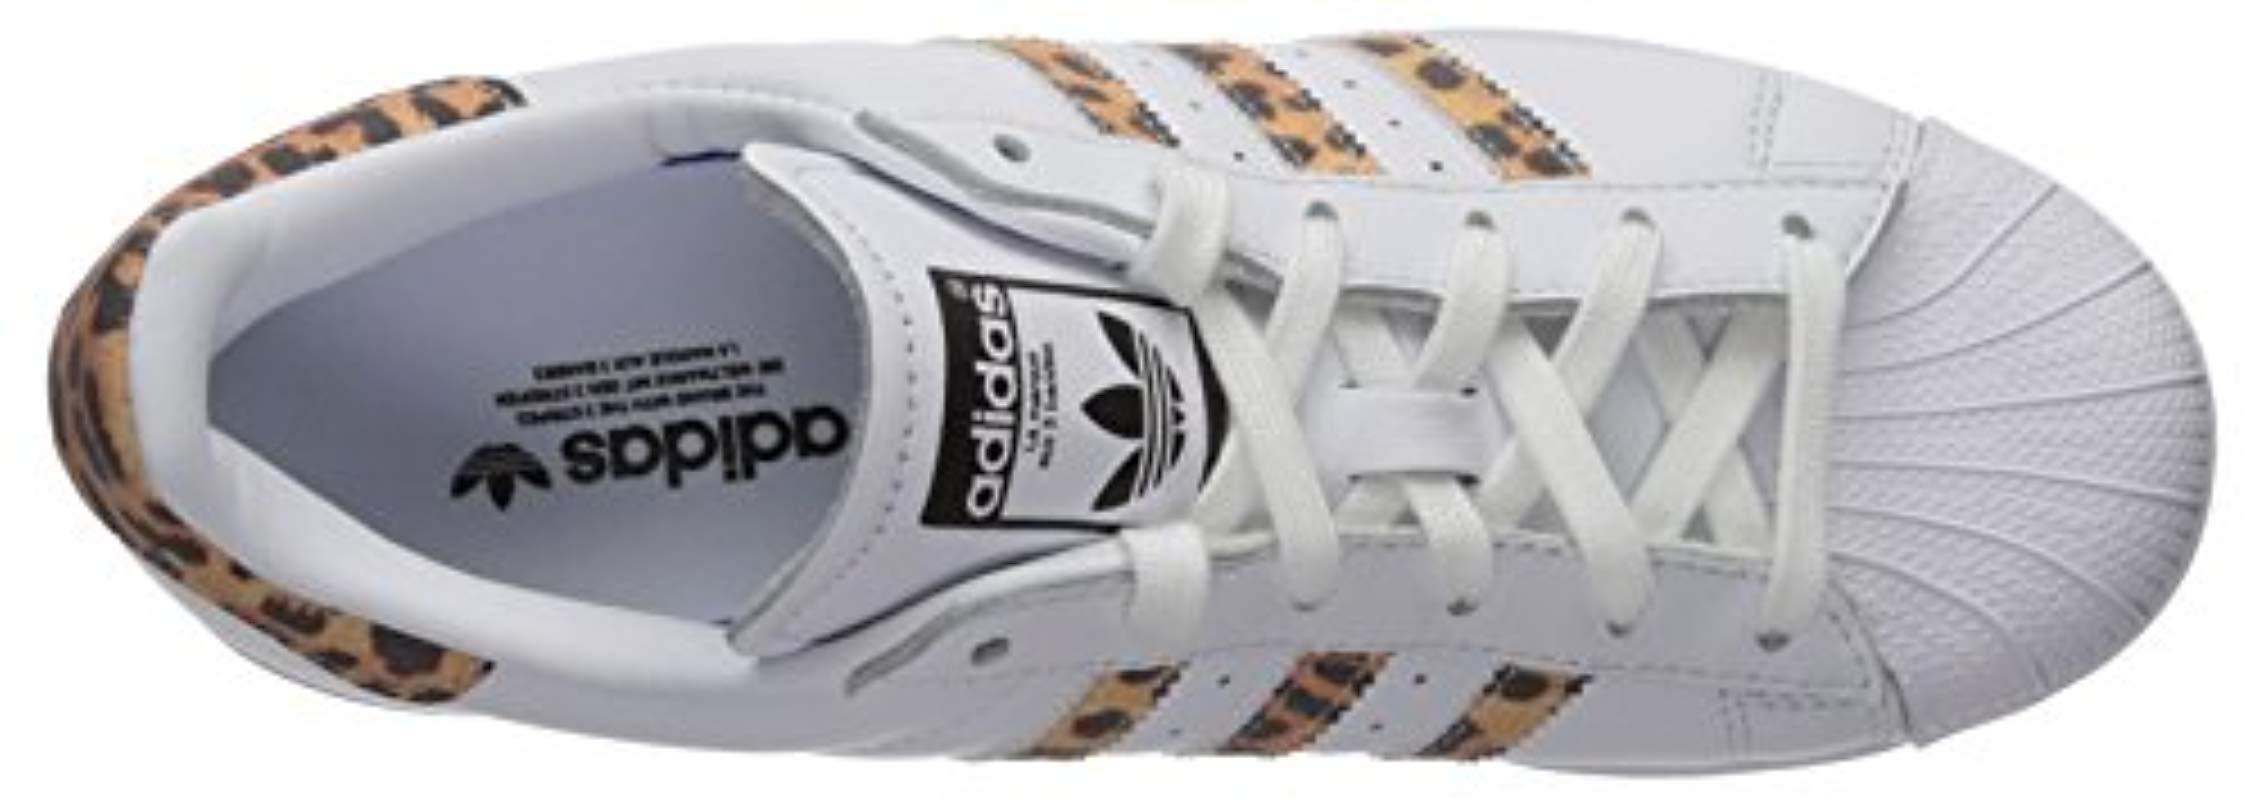 b8c8e1a6b472 Lyst - adidas Originals Superstar Shoes Sneaker